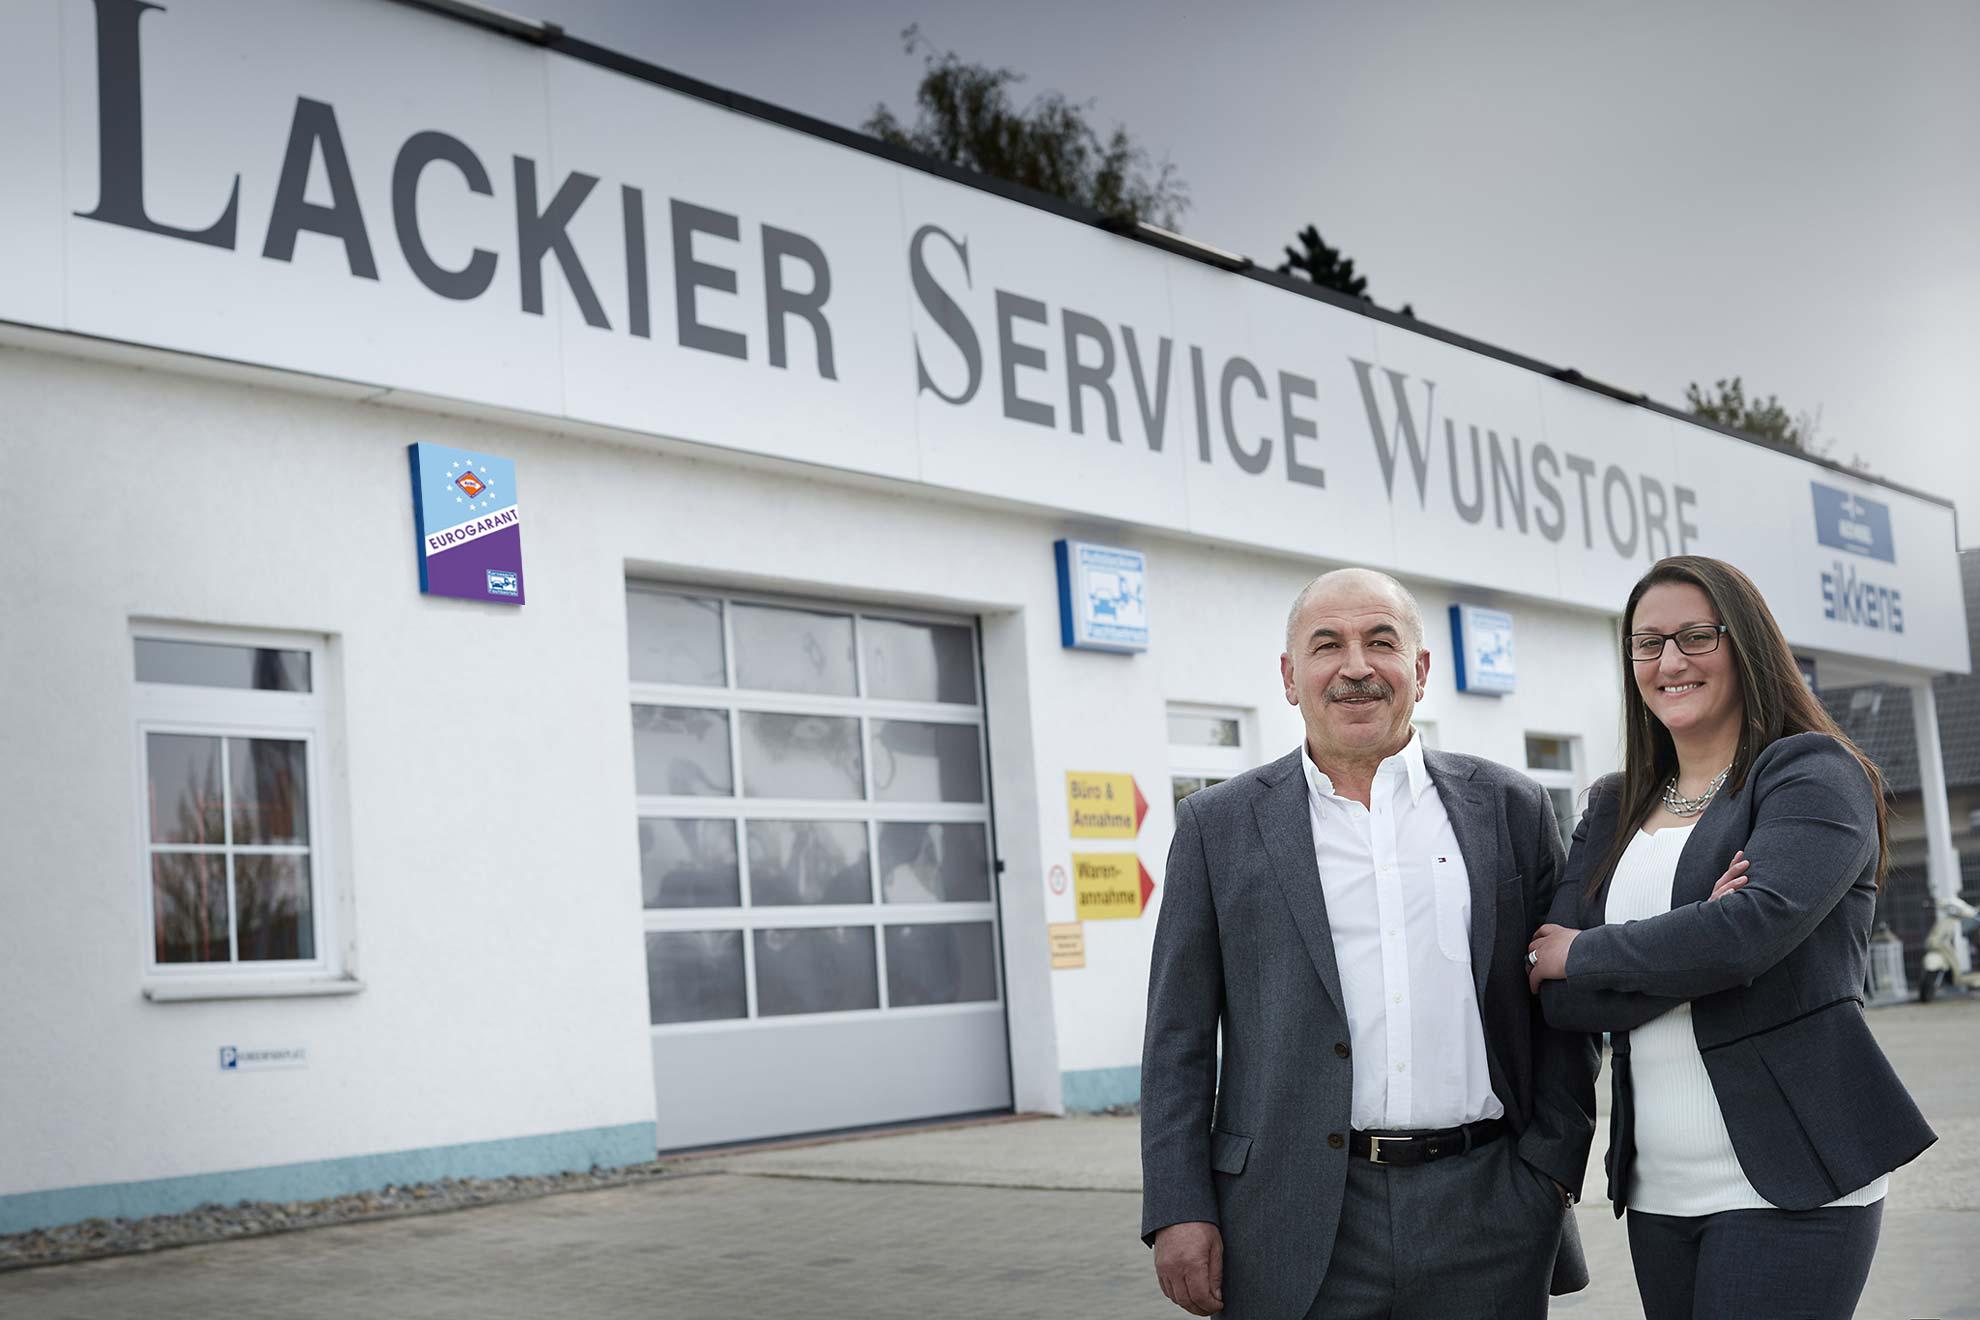 Lackier Service Wunstorf